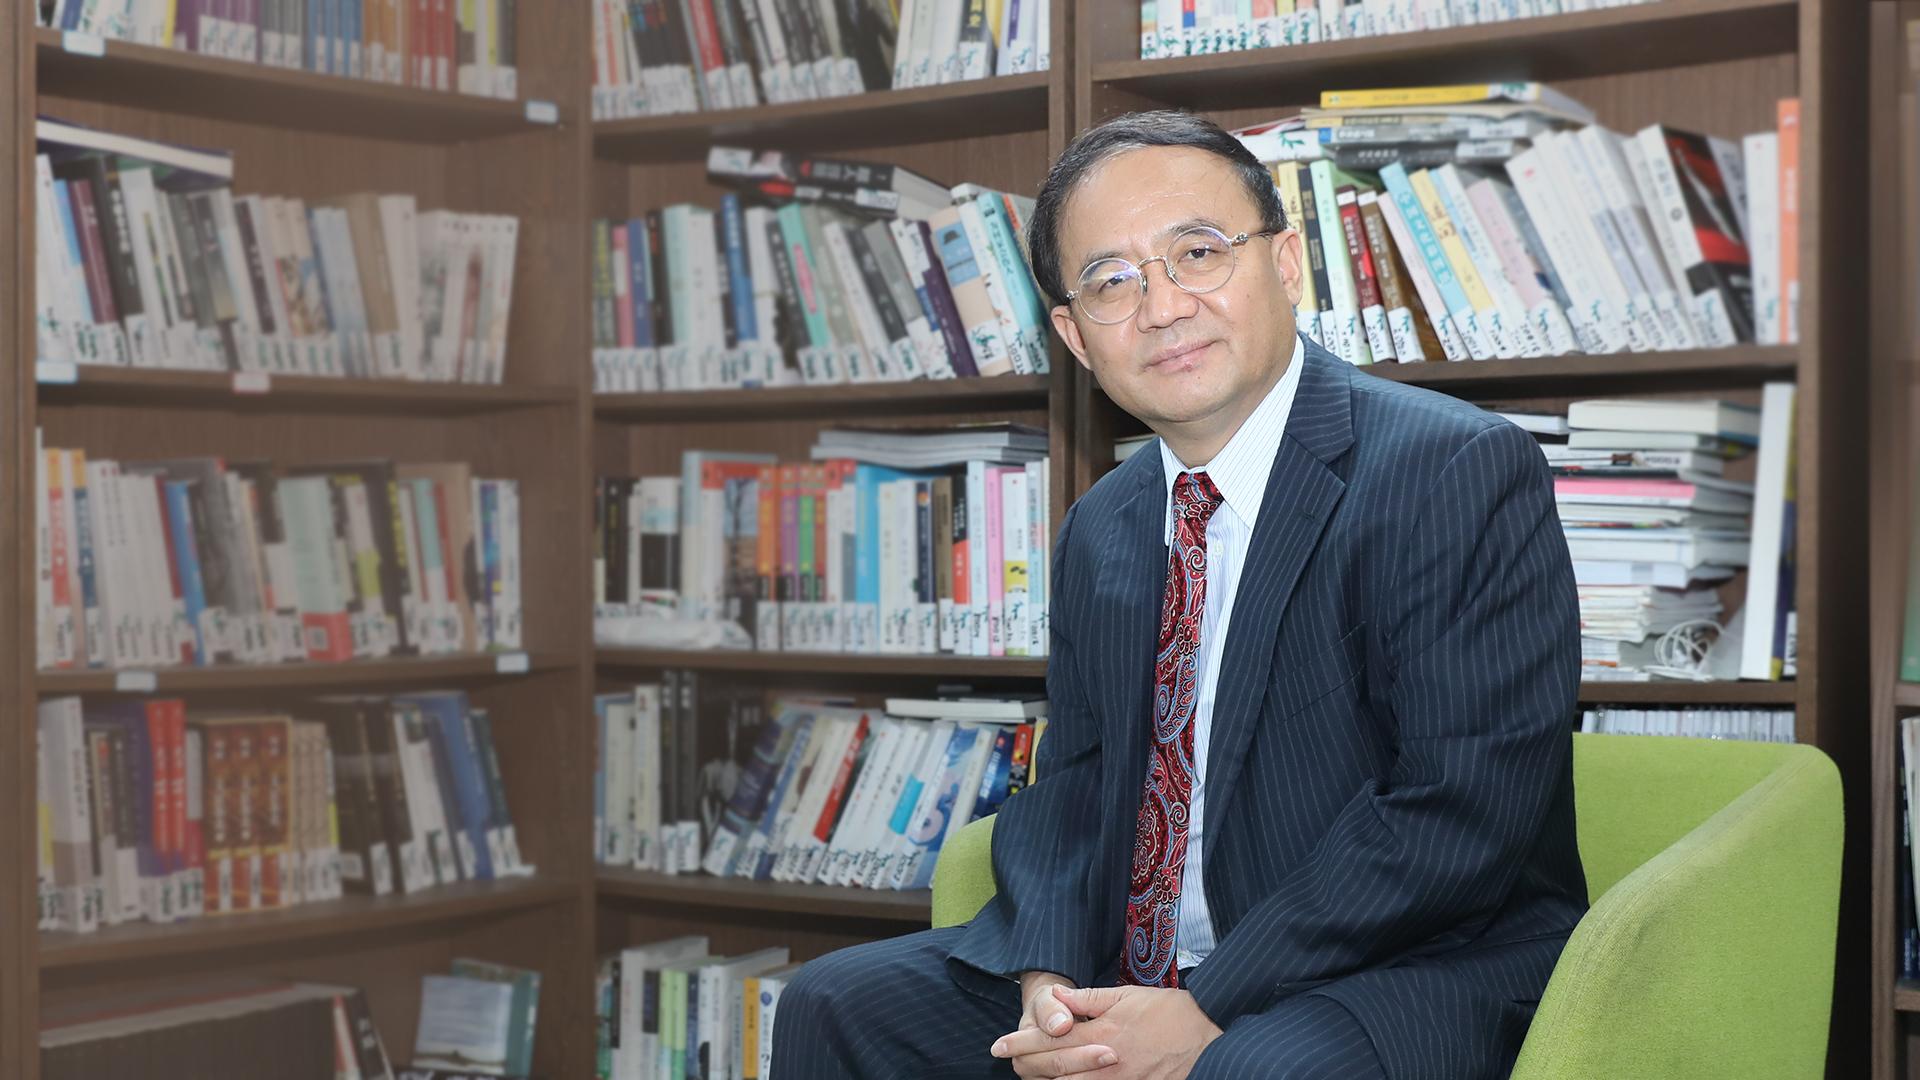 School of Innovation and Entrepreneurship Dean Liu Ke: Cultivating Innovative Entrepreneurial Dreamers